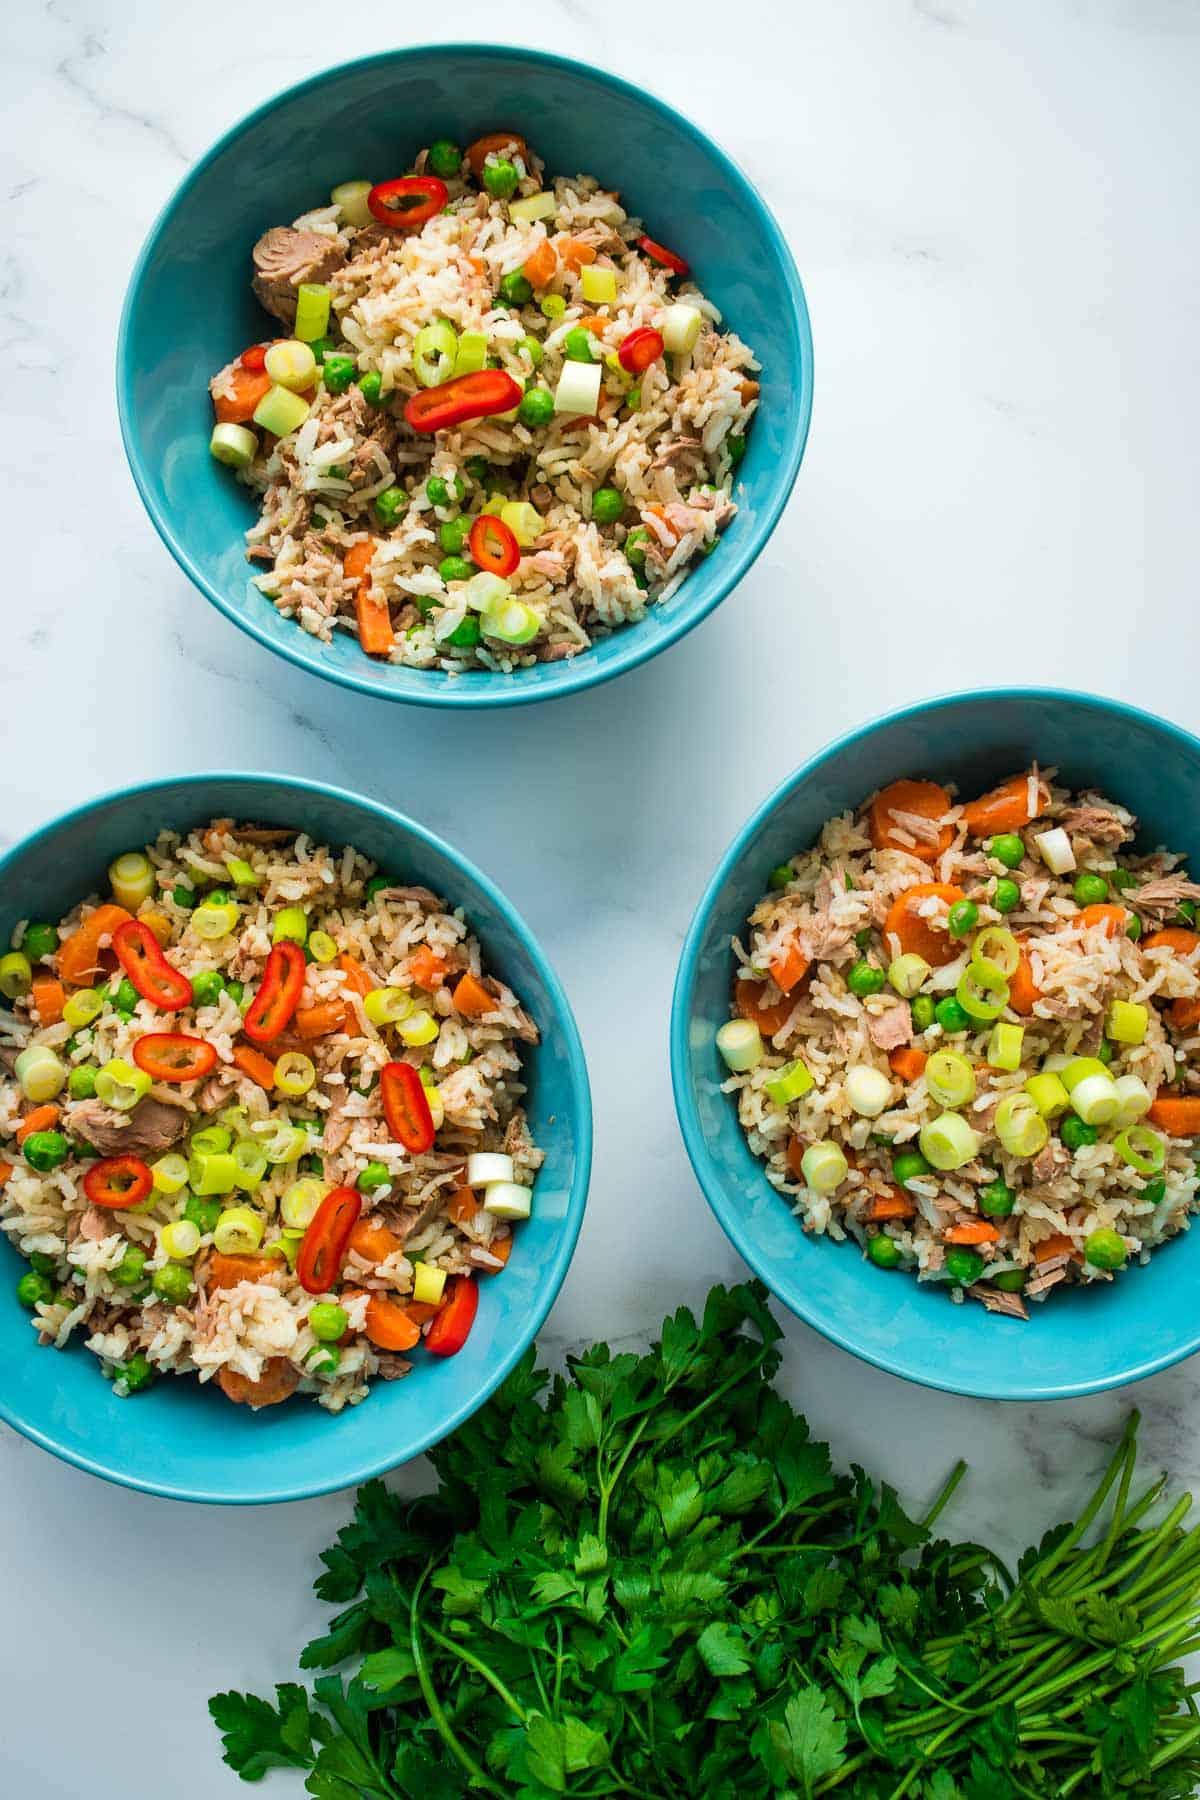 Colorful fried rice with tuna.